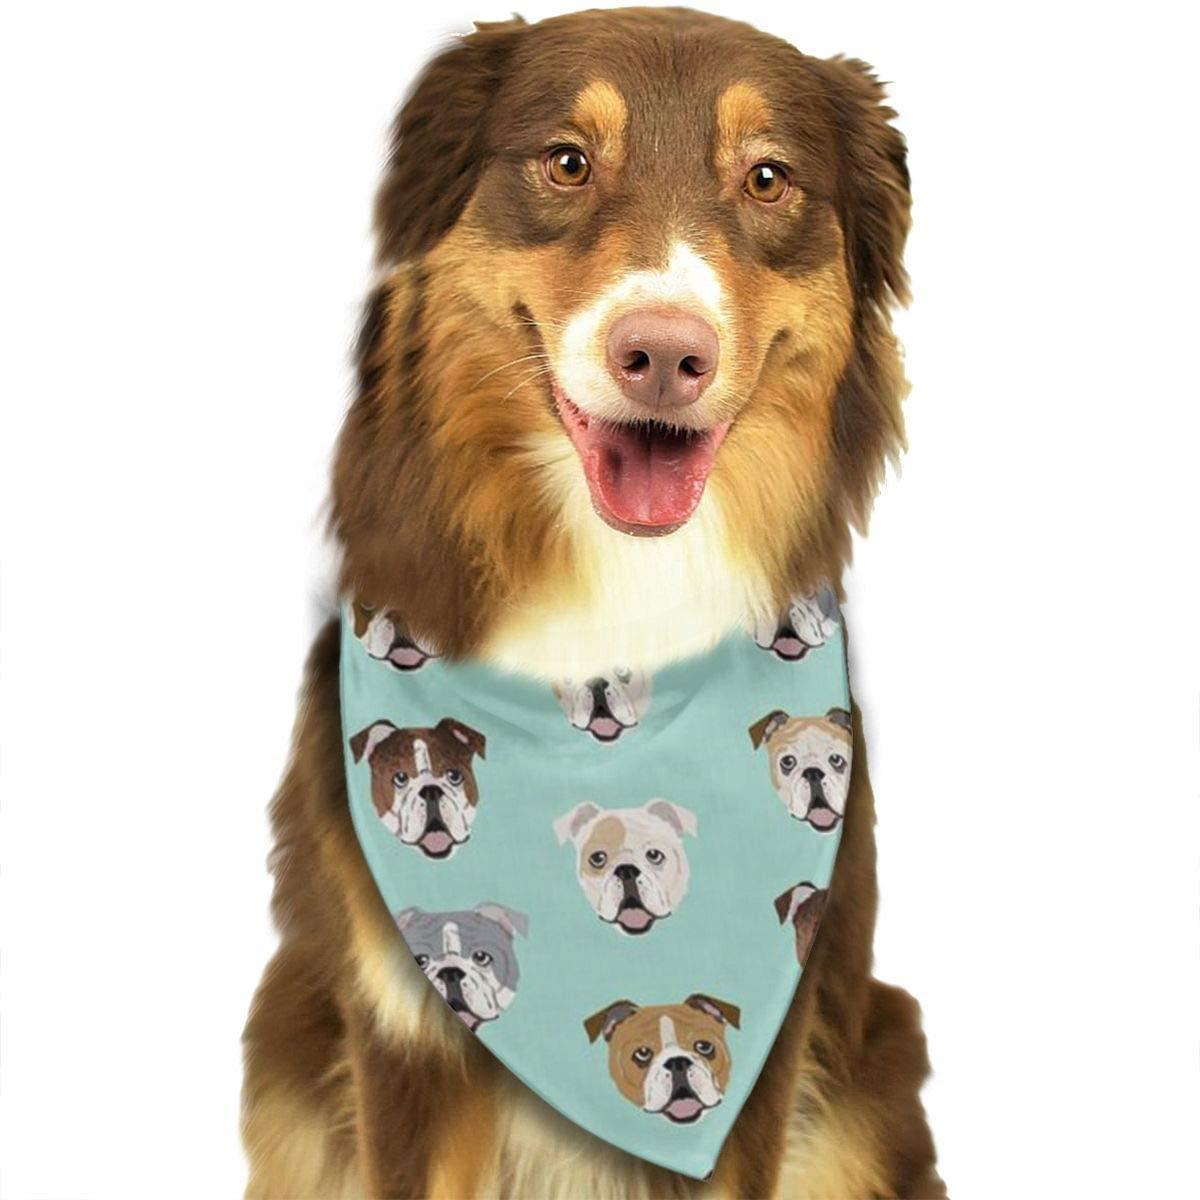 NiYoung Dog Bandana Funny Bulldog Pattern Pet Scarf Triangle Bibs Kerchief Set Pet Costume Accessories Decoration for Small Medium Large Dogs Cats Pets